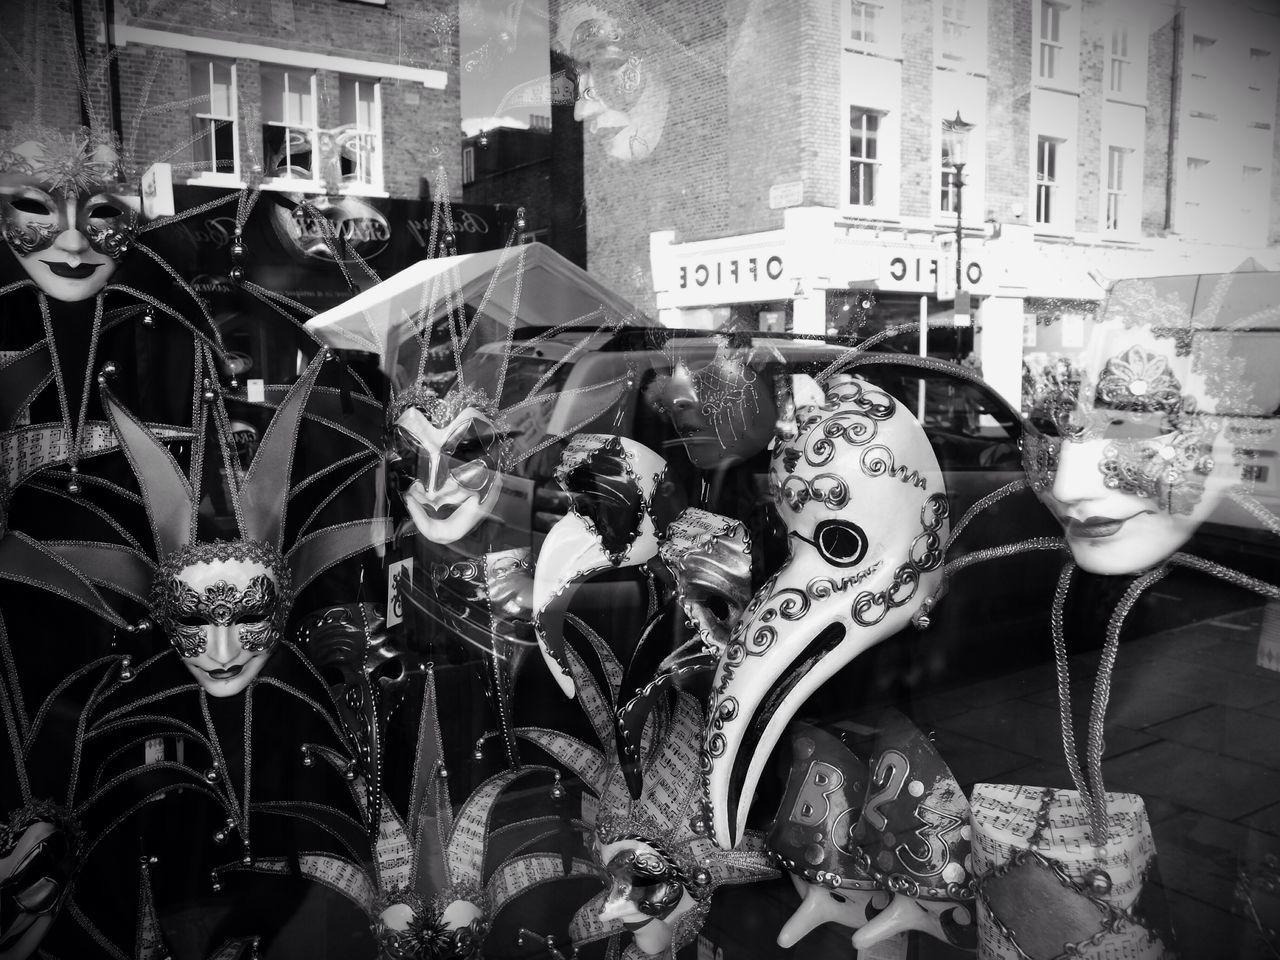 Reflections and masks, Portobello Road, London, U.K., Olympus Stevesevilempire Steve Merrick London Zuiko Uk Reflections Masks